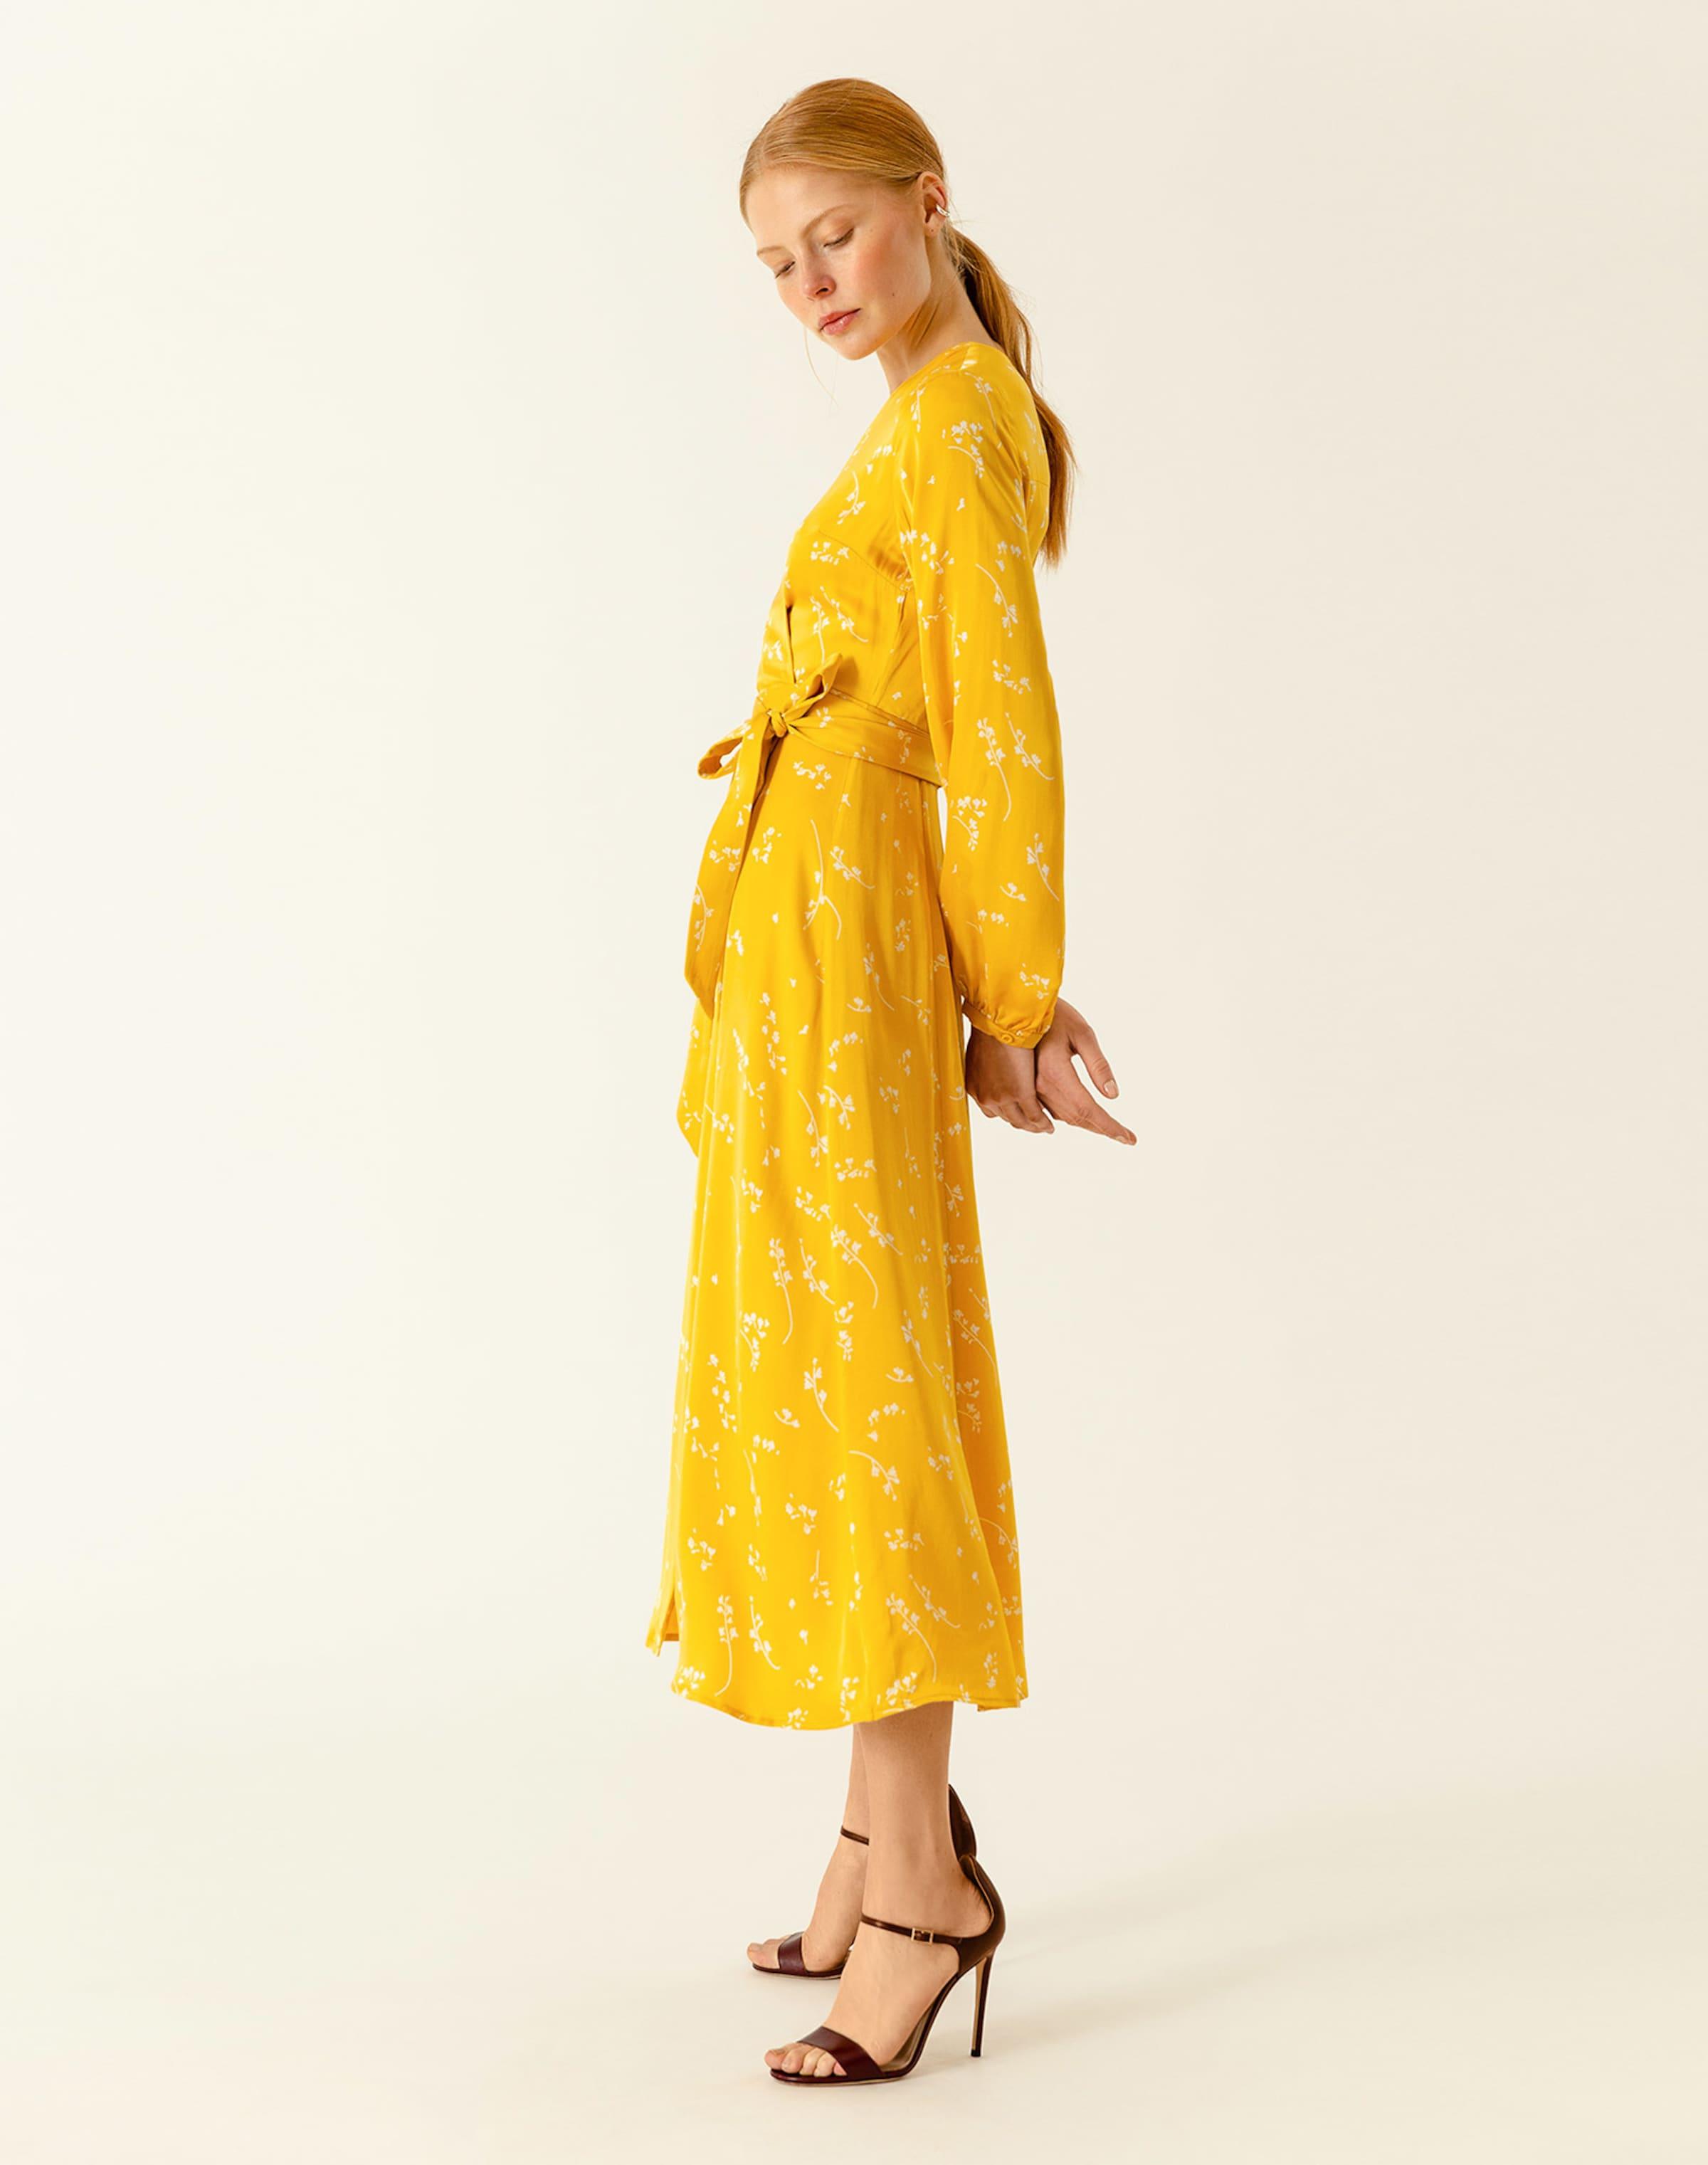 Oak LimoneWeiß Ivyamp; Kleid Oak Kleid Ivyamp; In ul13FcTKJ